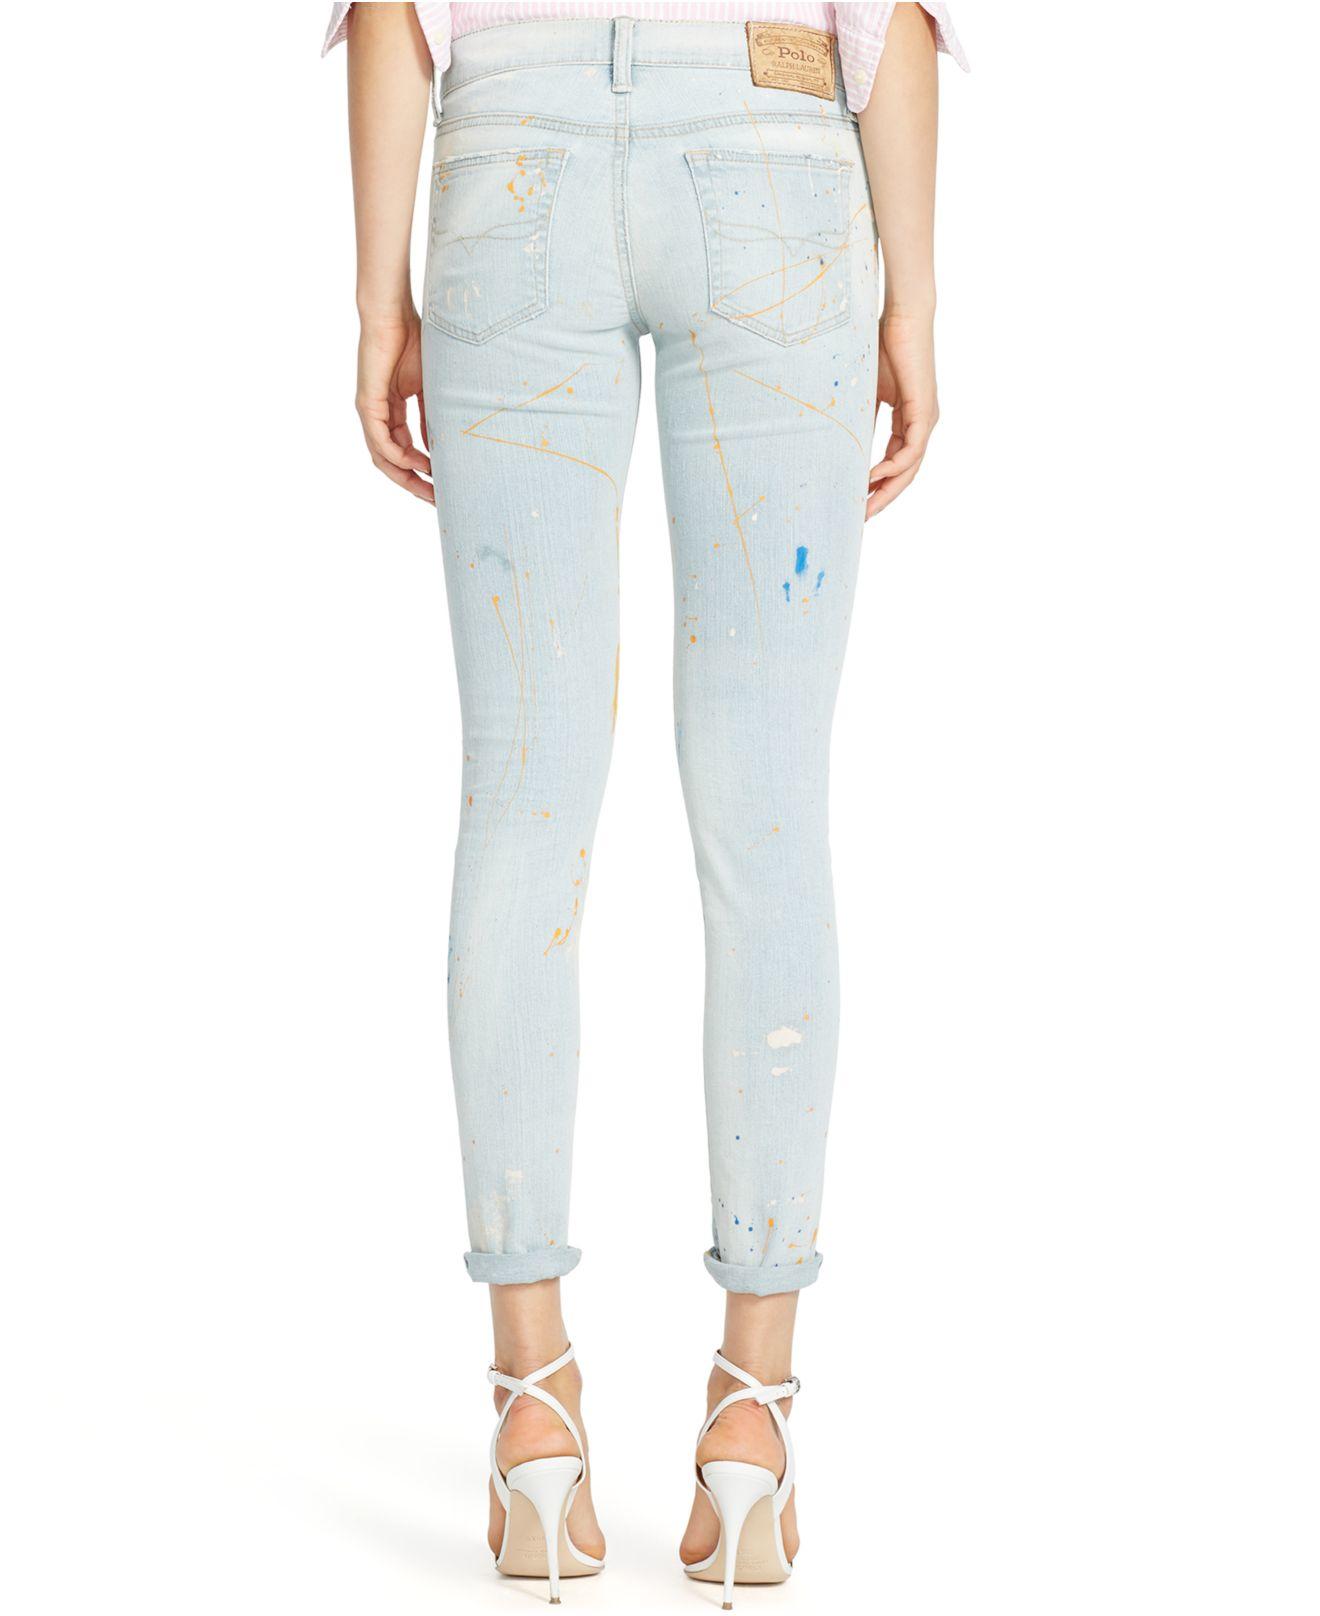 fee4e72392 Polo Ralph Lauren Blue Tompkins Cropped Skinny Jeans